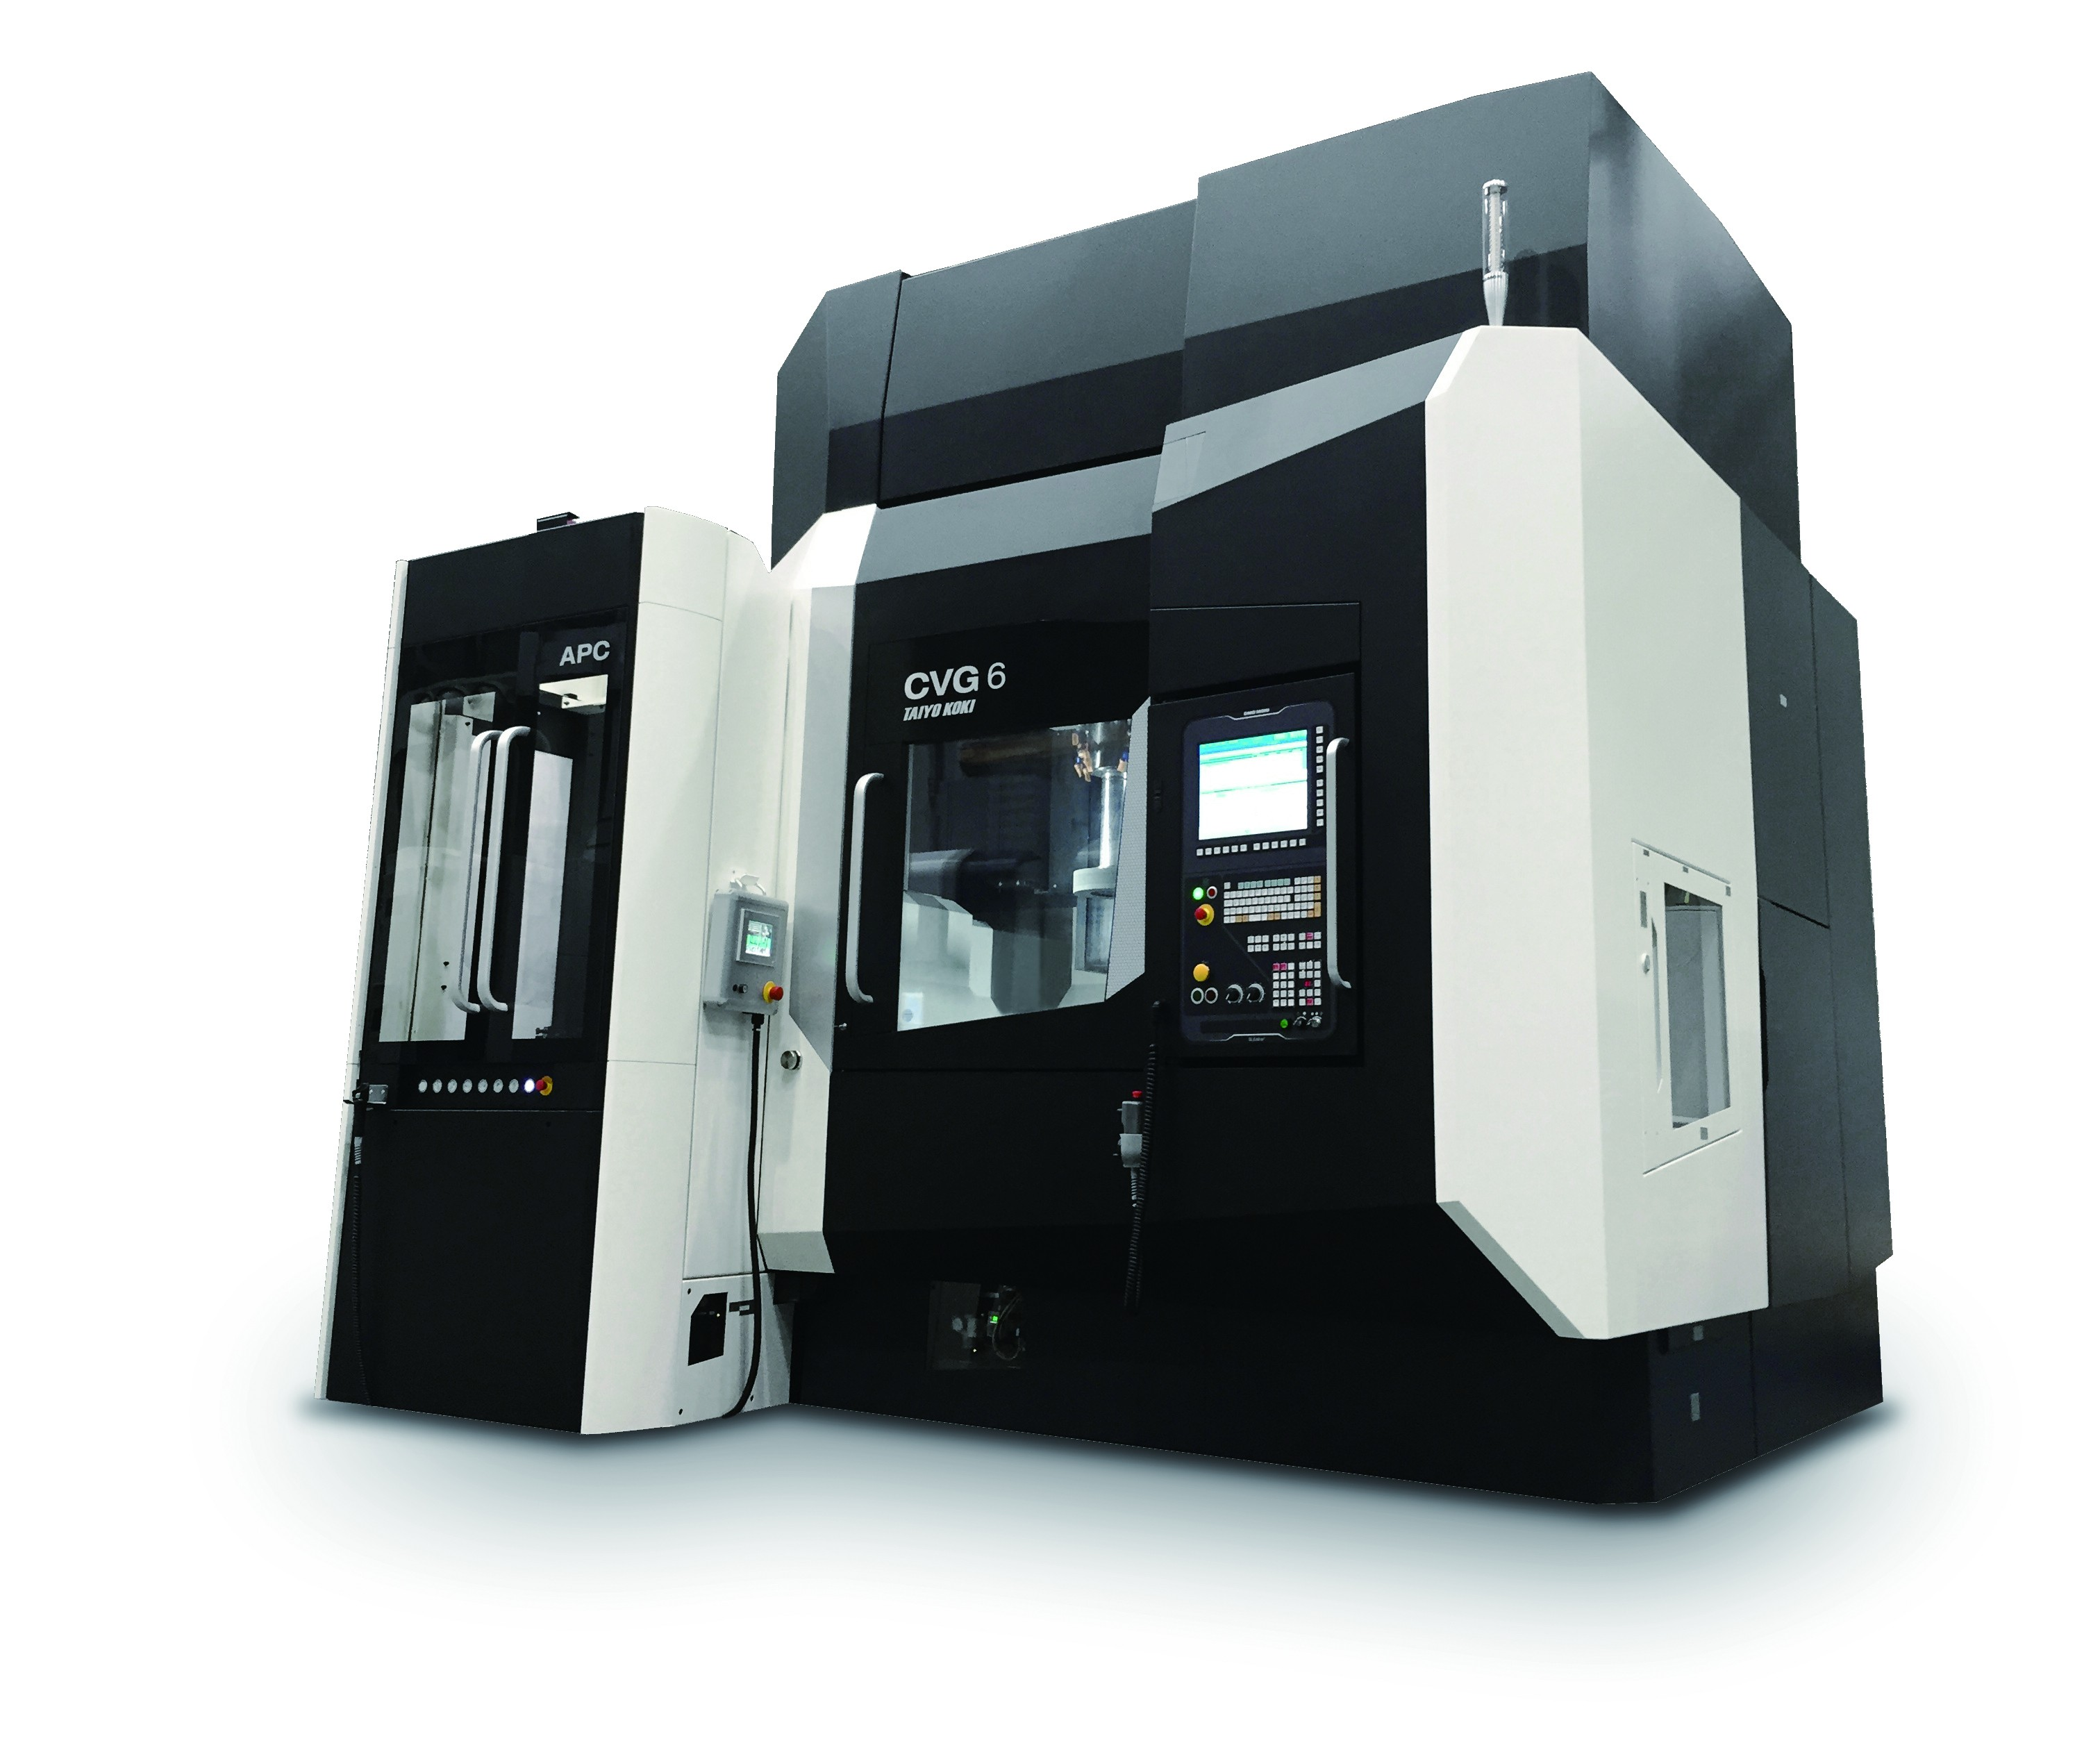 CVG Series Vertical Universal Cylindrical Grinding machine from Tayio Koki Grinding Machine Company/DMG Mori